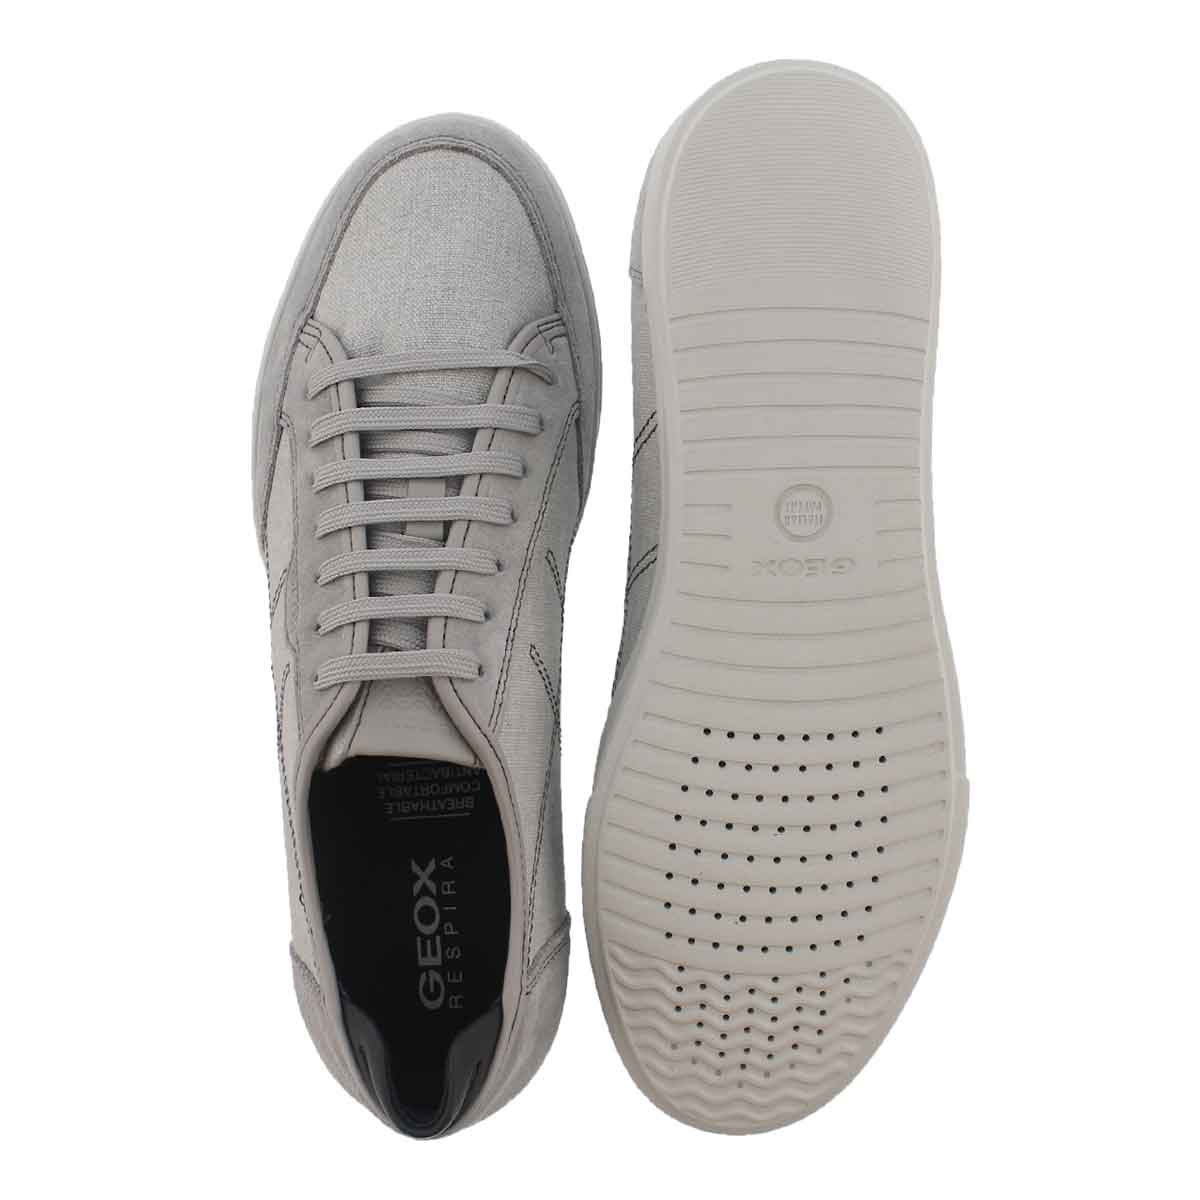 Mns Walee light grey fashion sneaker